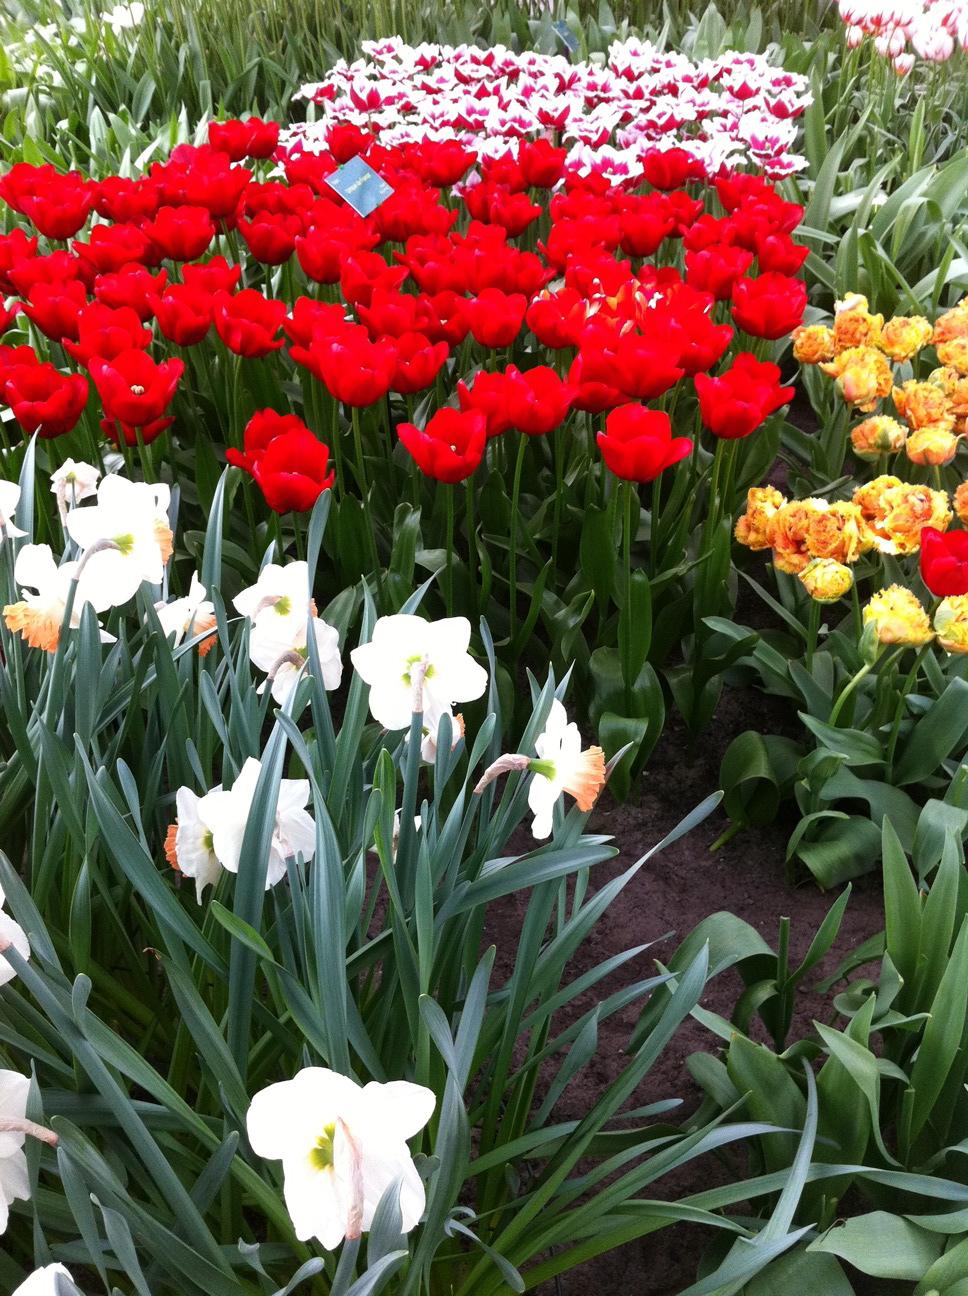 2011-04-22-photo46.jpg